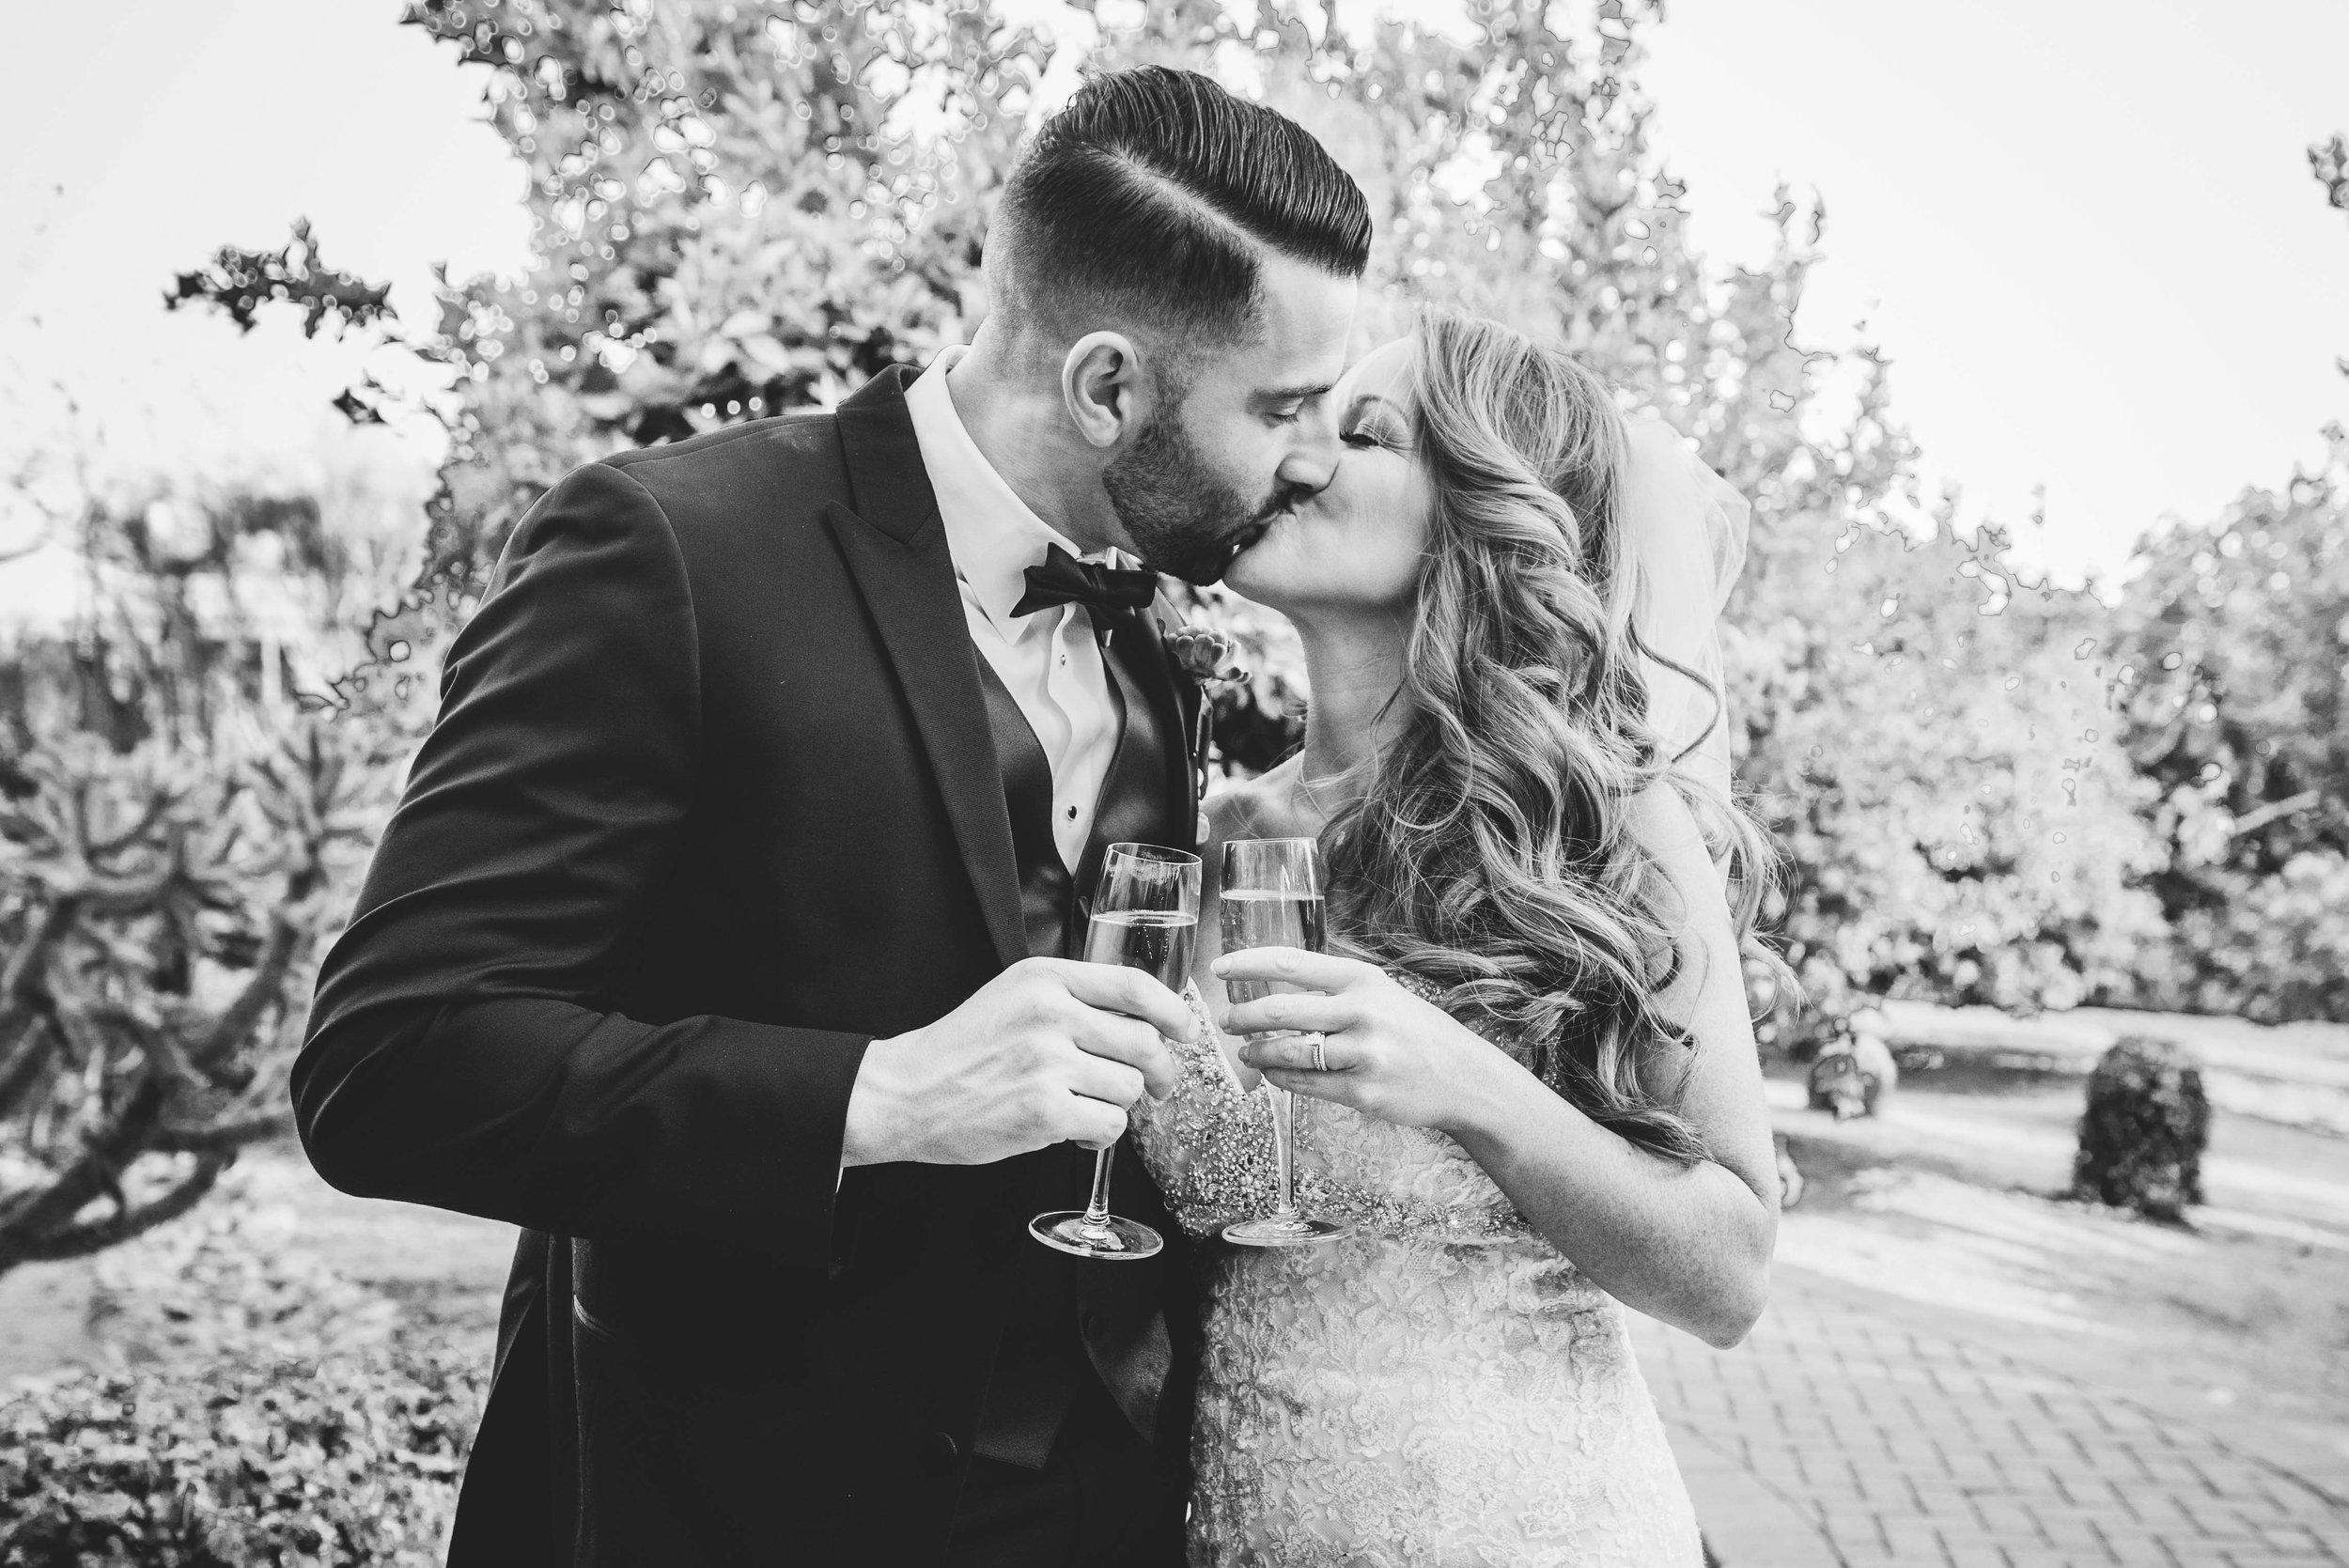 weddingwebsitesmallerpics-178.jpg